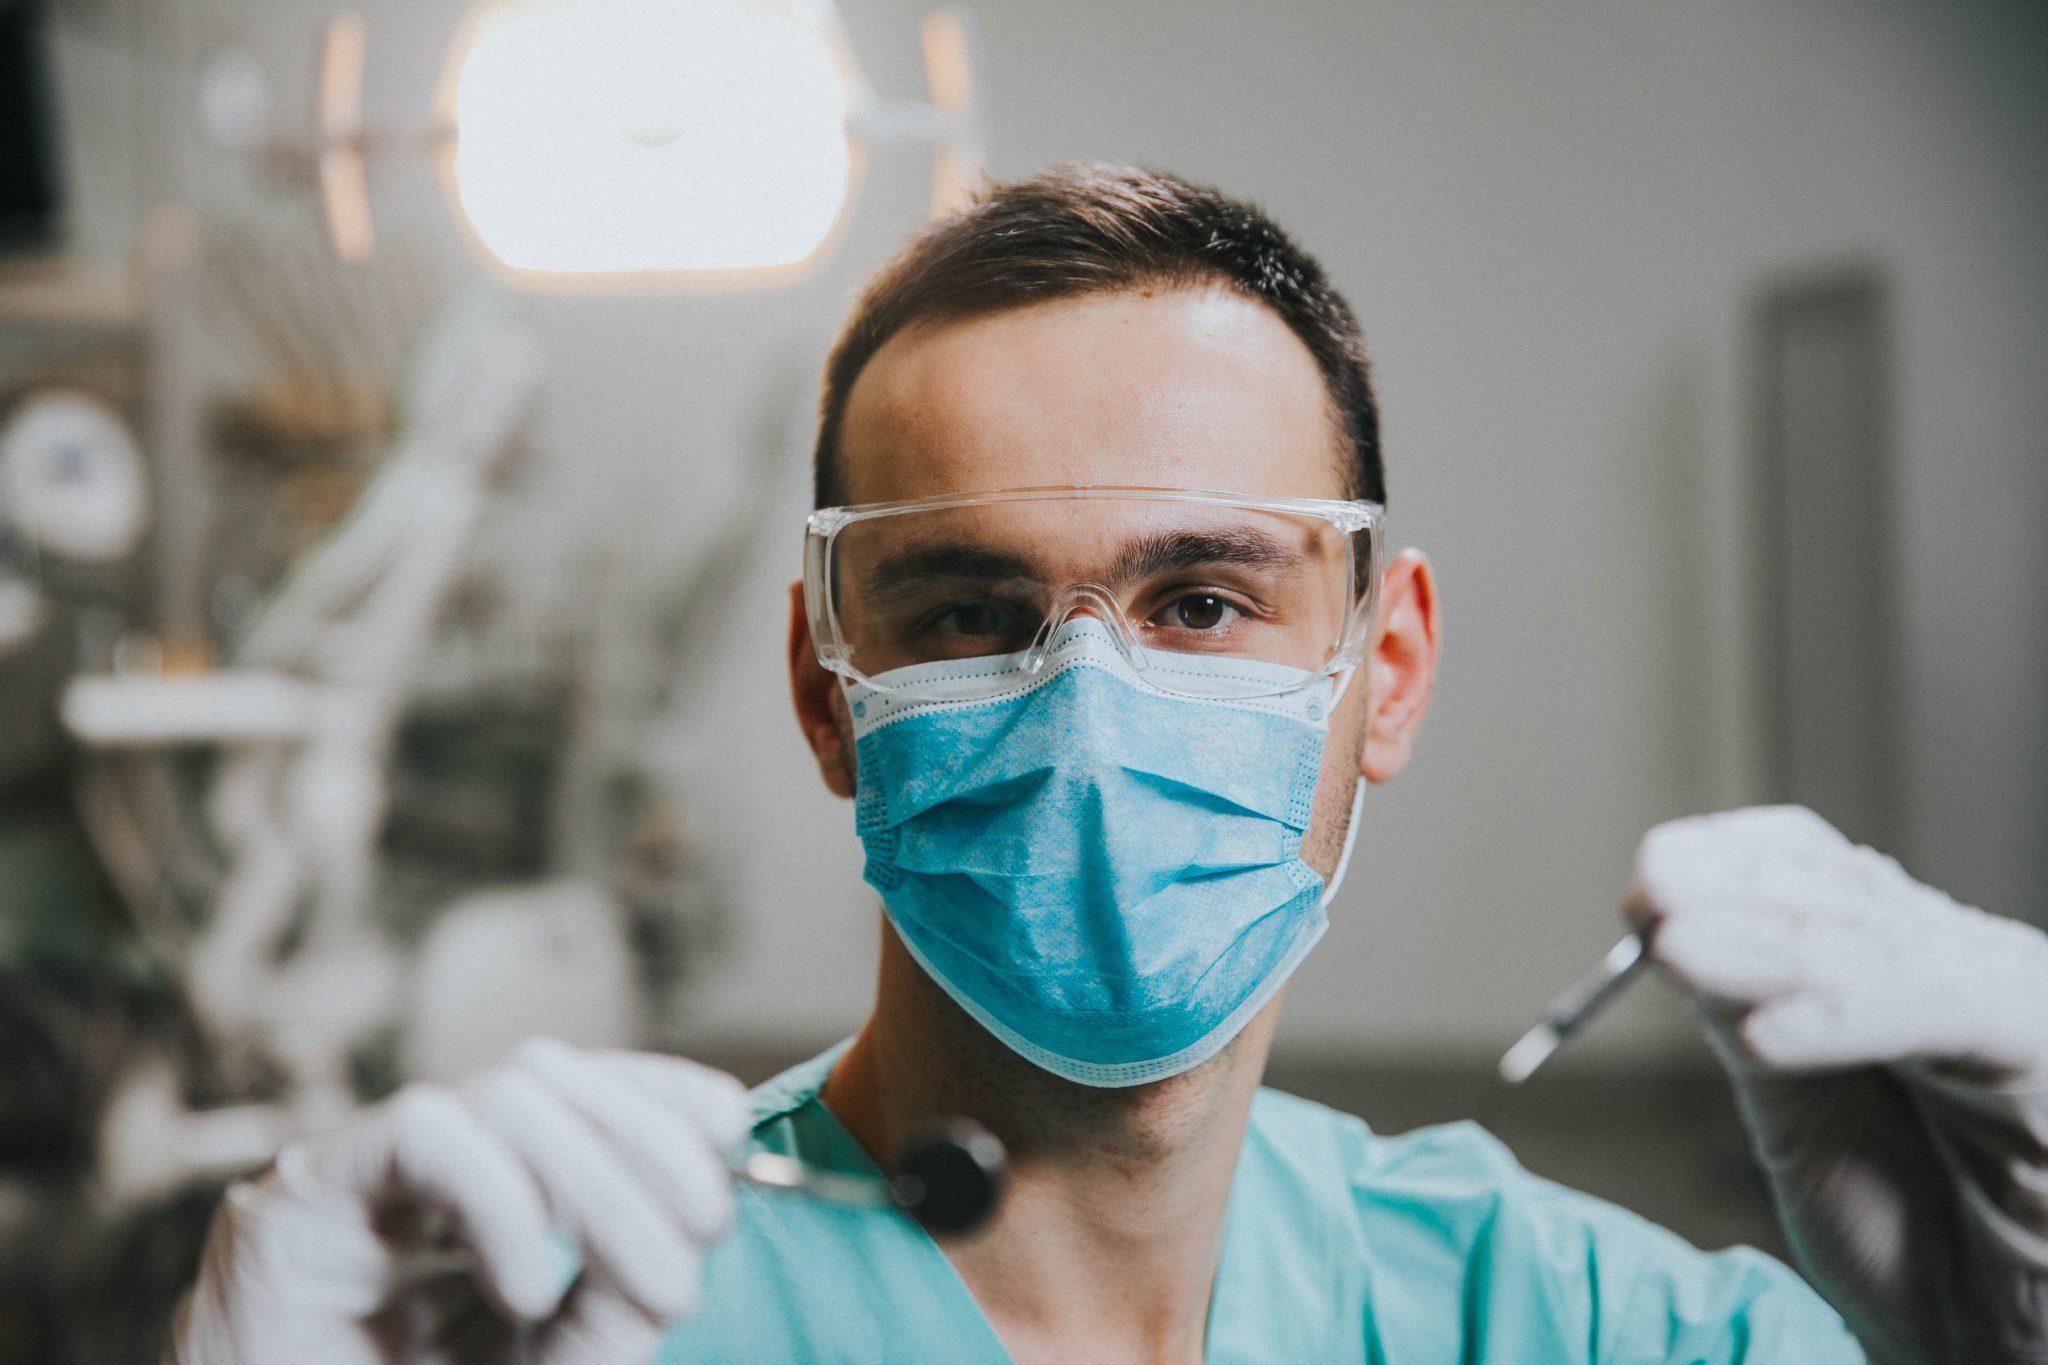 facultatea de stamatologie targu mures UMF absolvenit stamatolog medic doctor fotografie comerciala fotograf profesionist majos daniel_-35